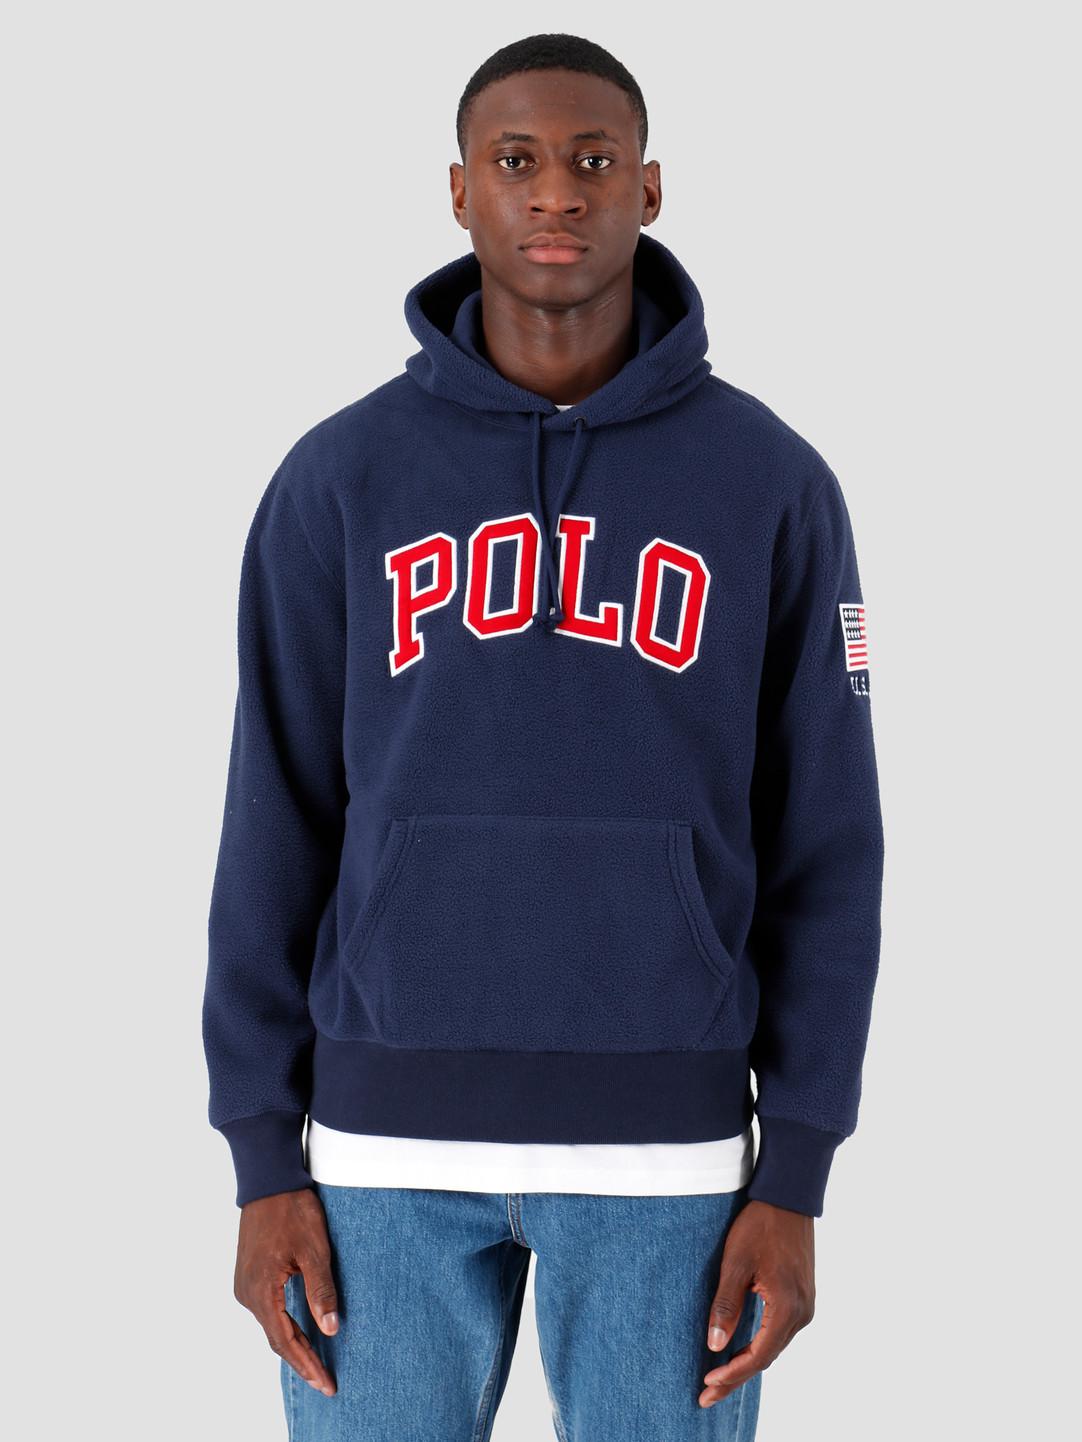 Polo Ralph Lauren Polo Ralph Lauren Vintage Polar Fleece Longsleeve Navy 710696327003